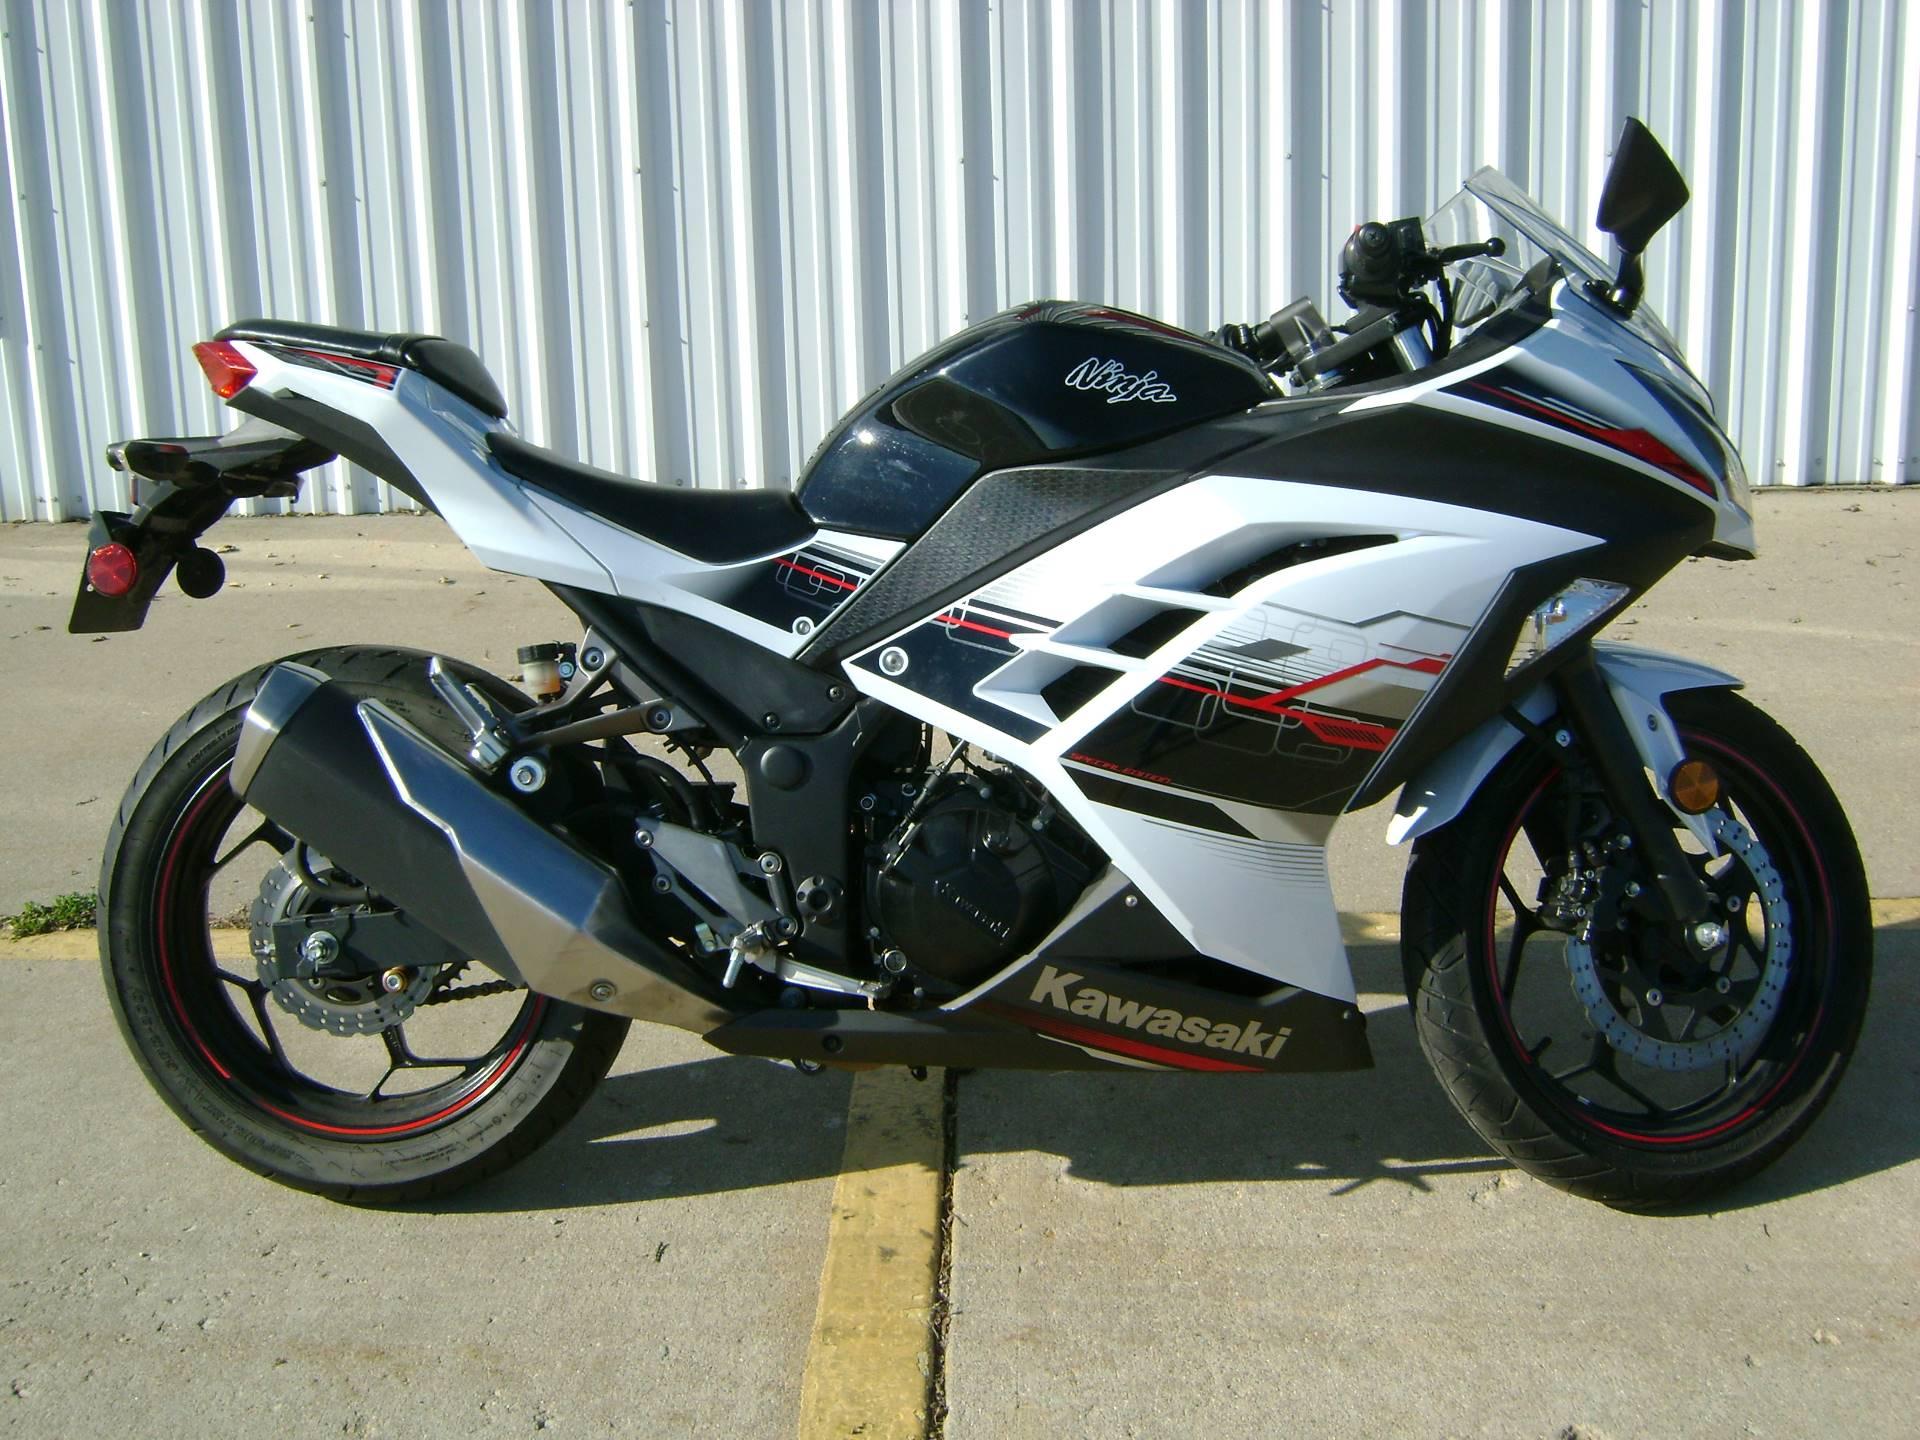 Used 2014 Kawasaki Ninja 300 Se Motorcycles In Freeport Il Stock